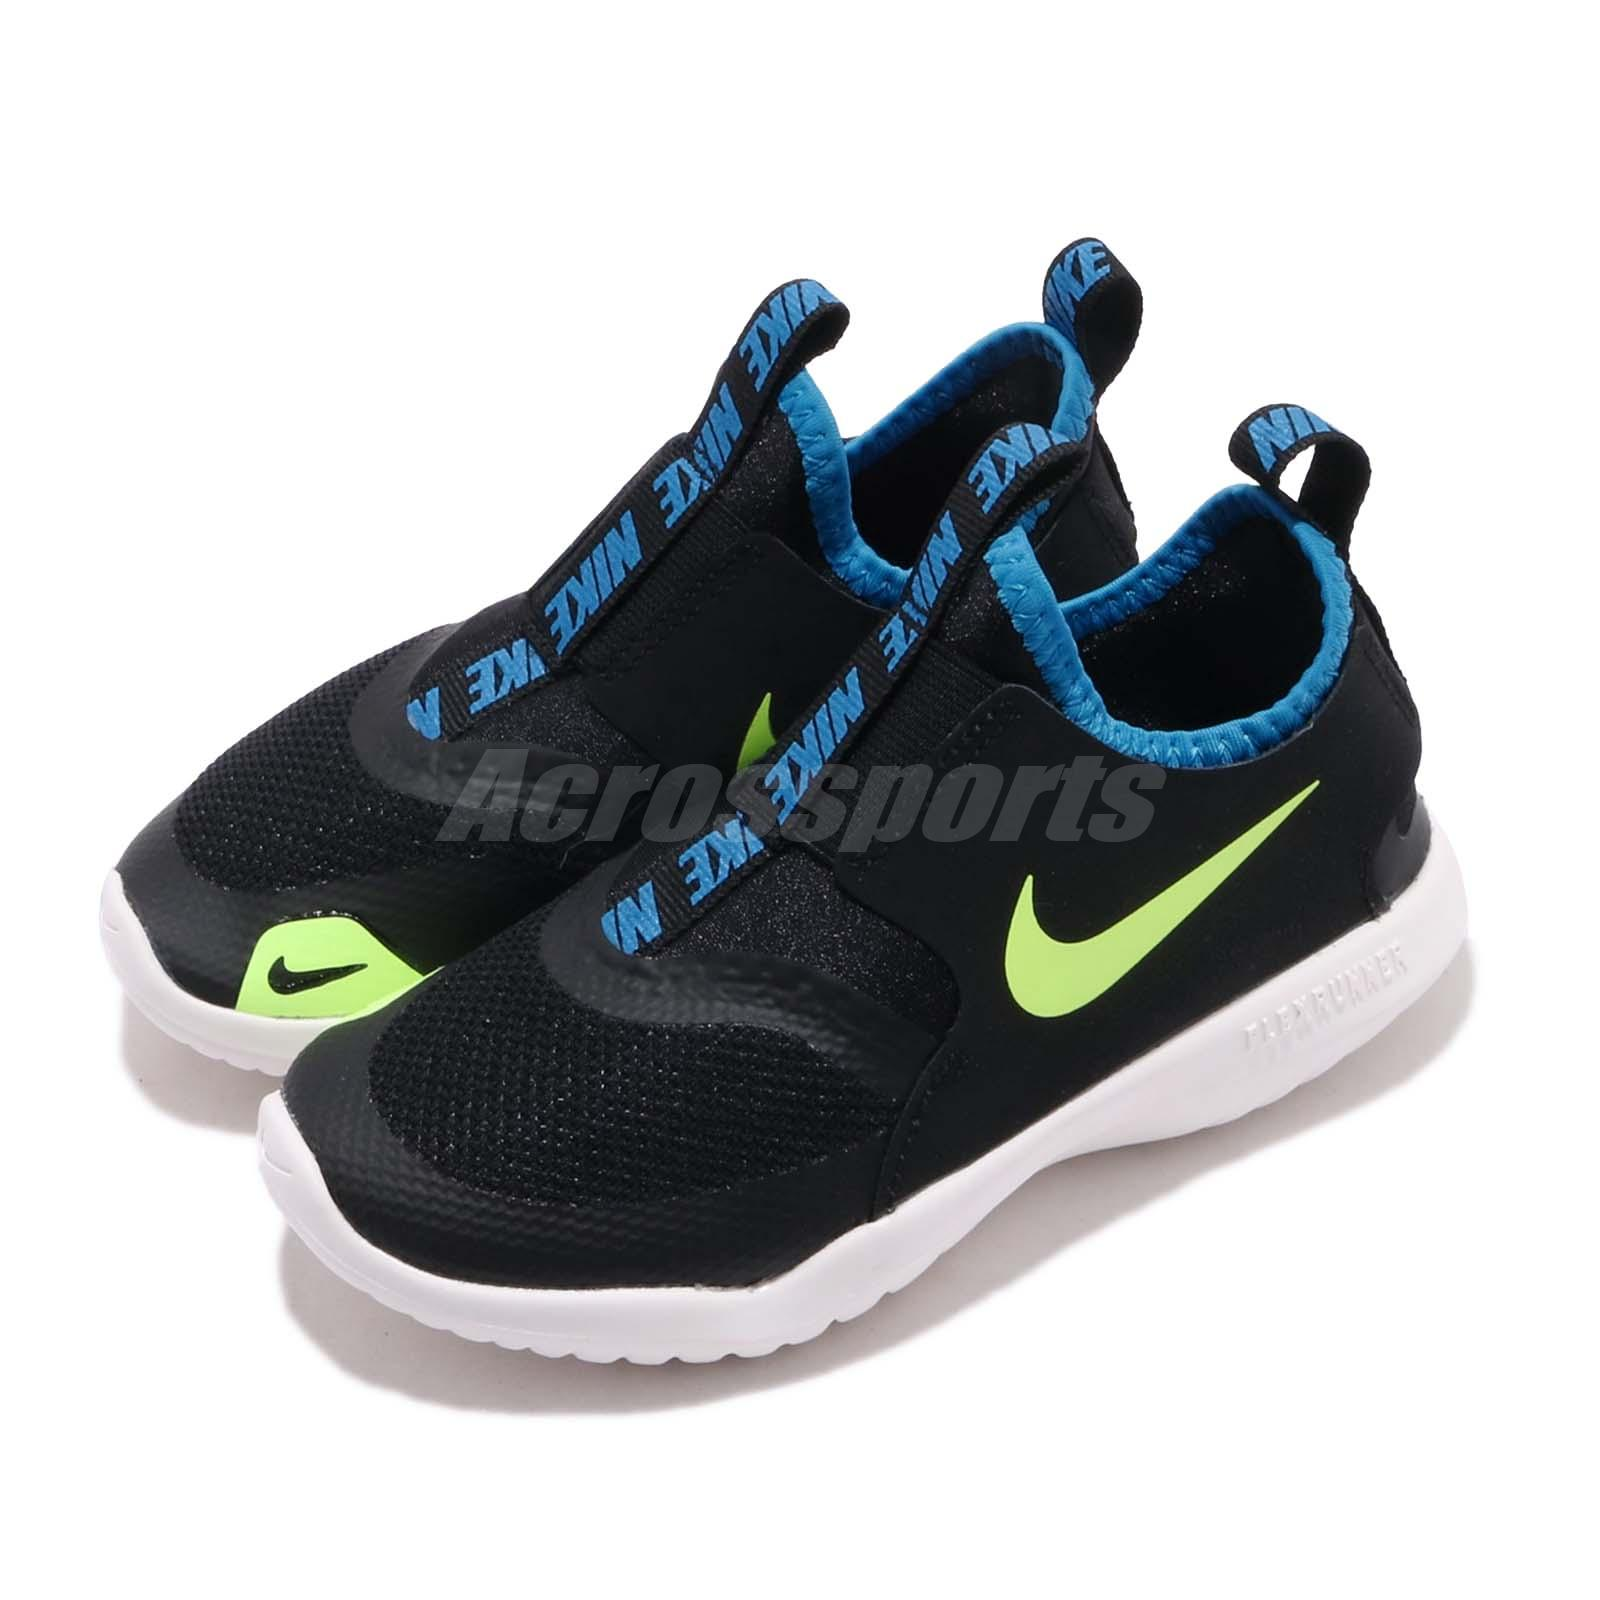 code promo 0fd12 311c7 Details about Nike Flex Runner PS Black Volt White Preschool Kids Running  Shoes AT4663-005